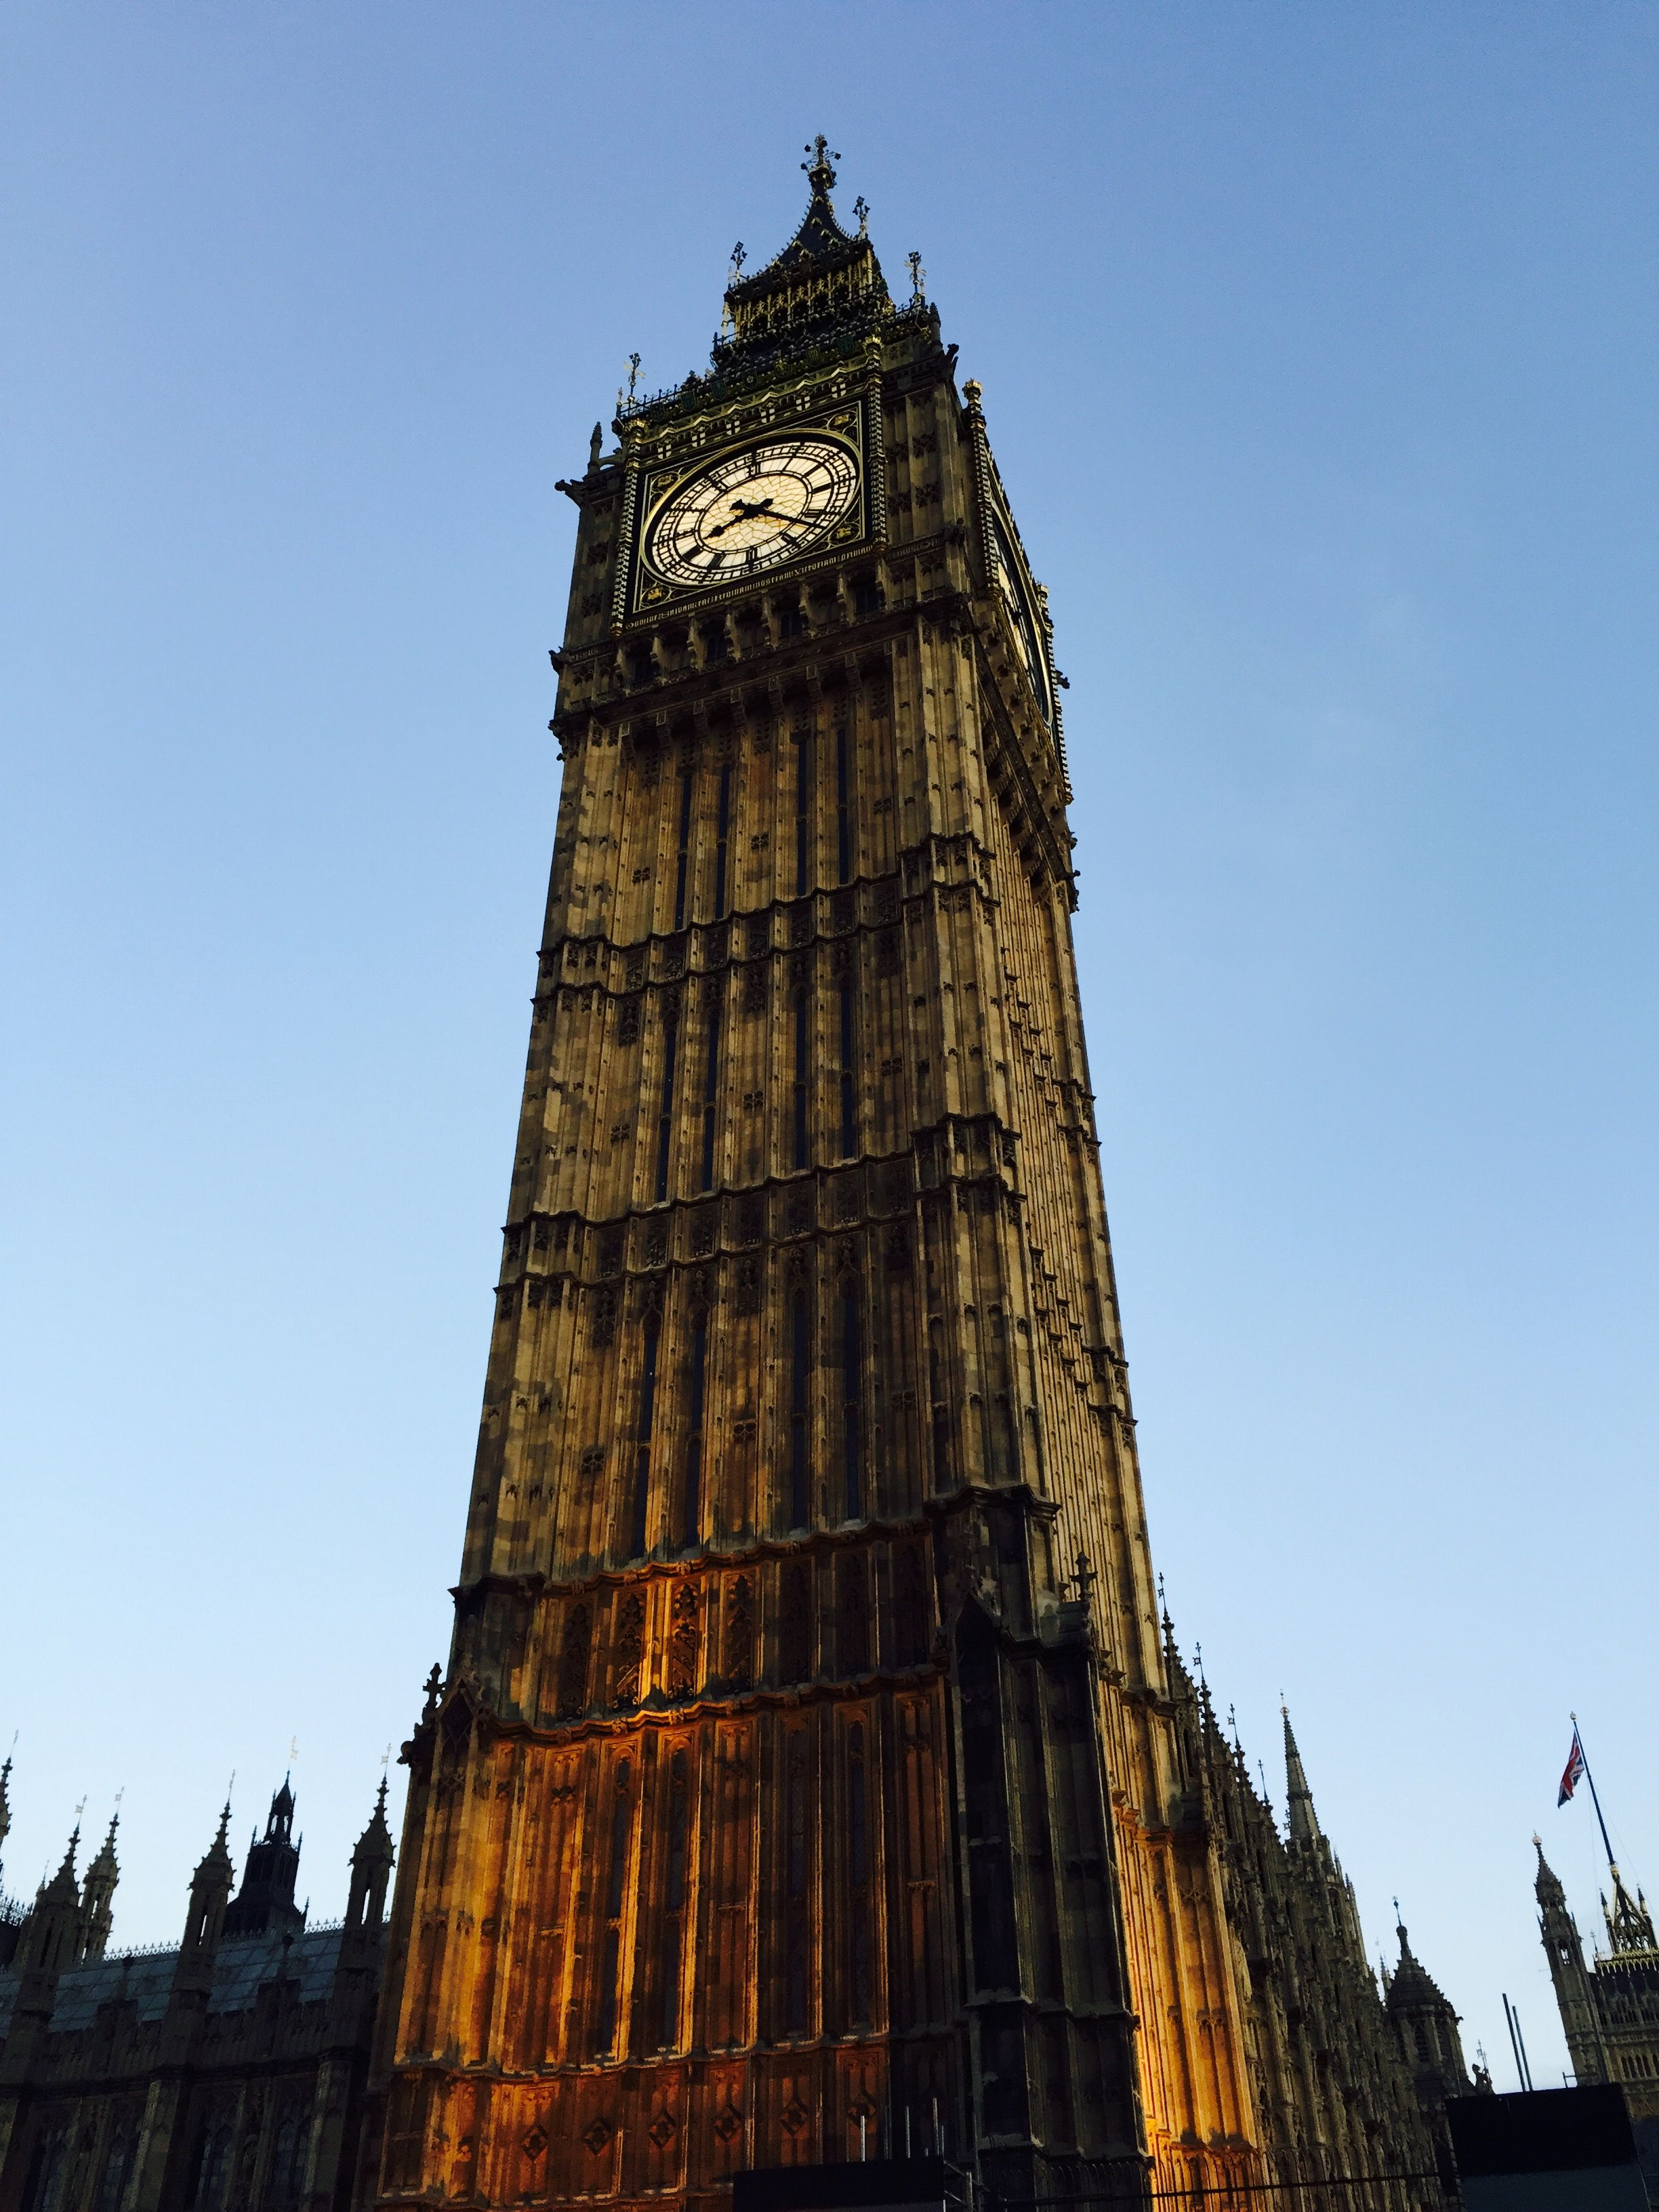 #BigBen #westminster #london